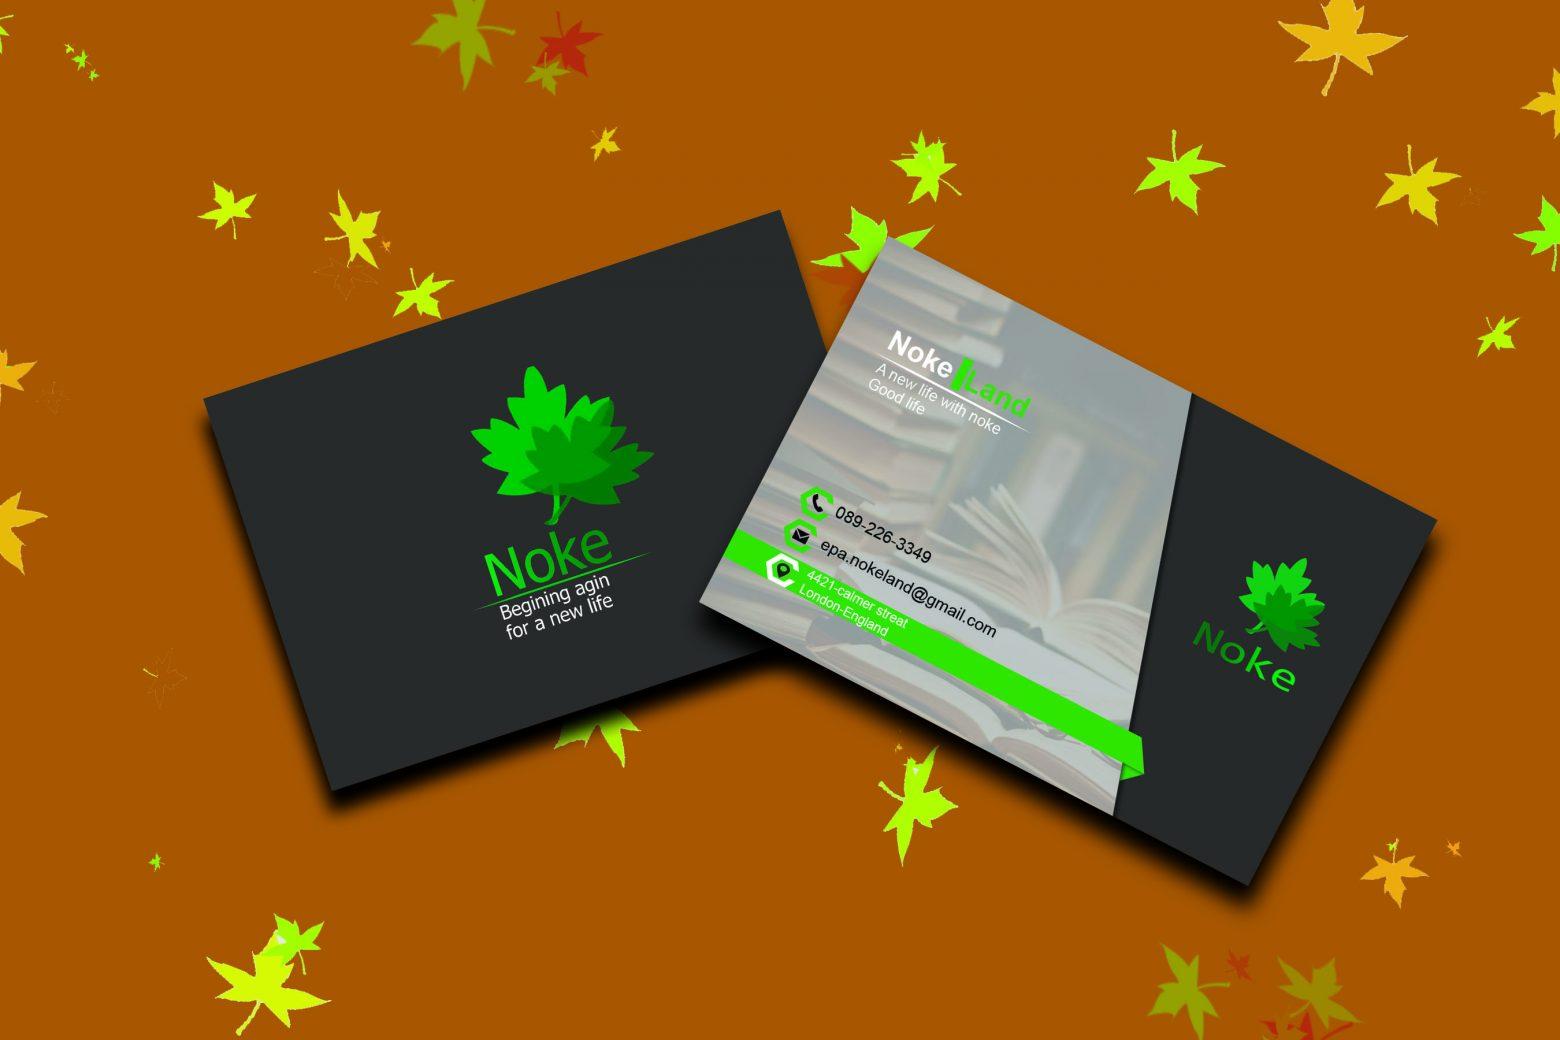 noke cards 1560x1040 - کارت ویزیت